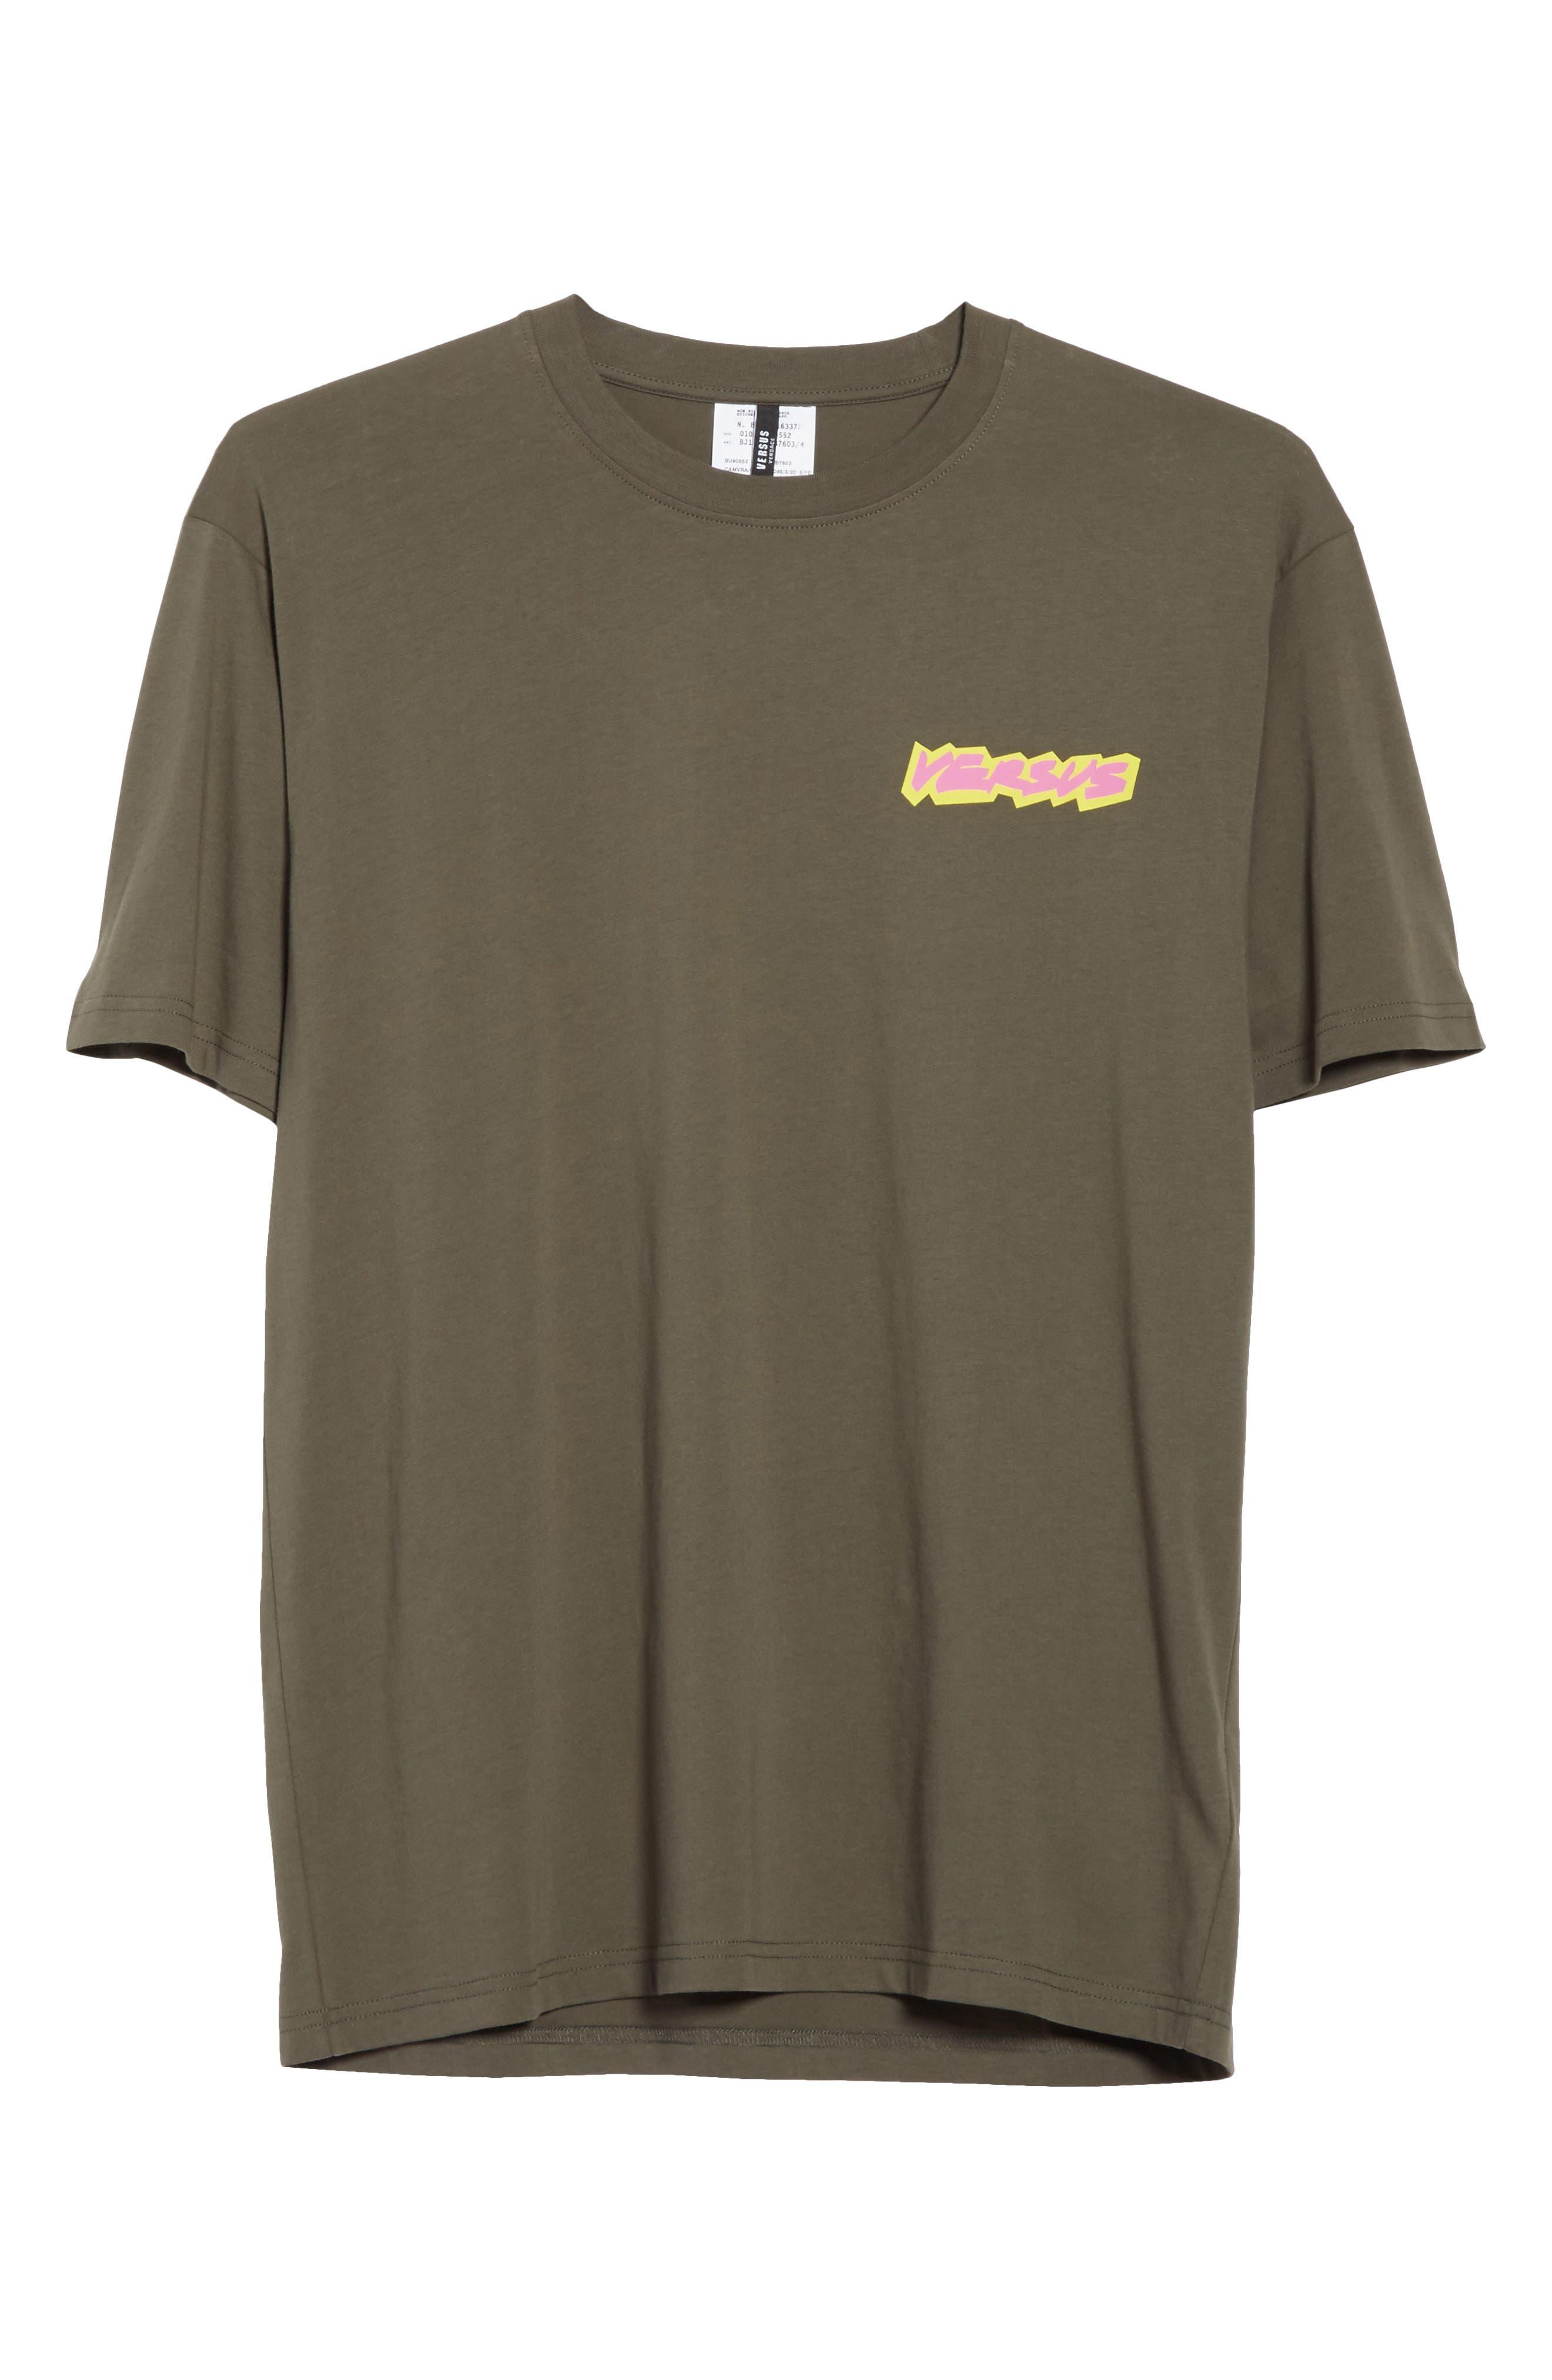 VERSUS by Versace Logo Graphic T-Shirt,                             Alternate thumbnail 6, color,                             344